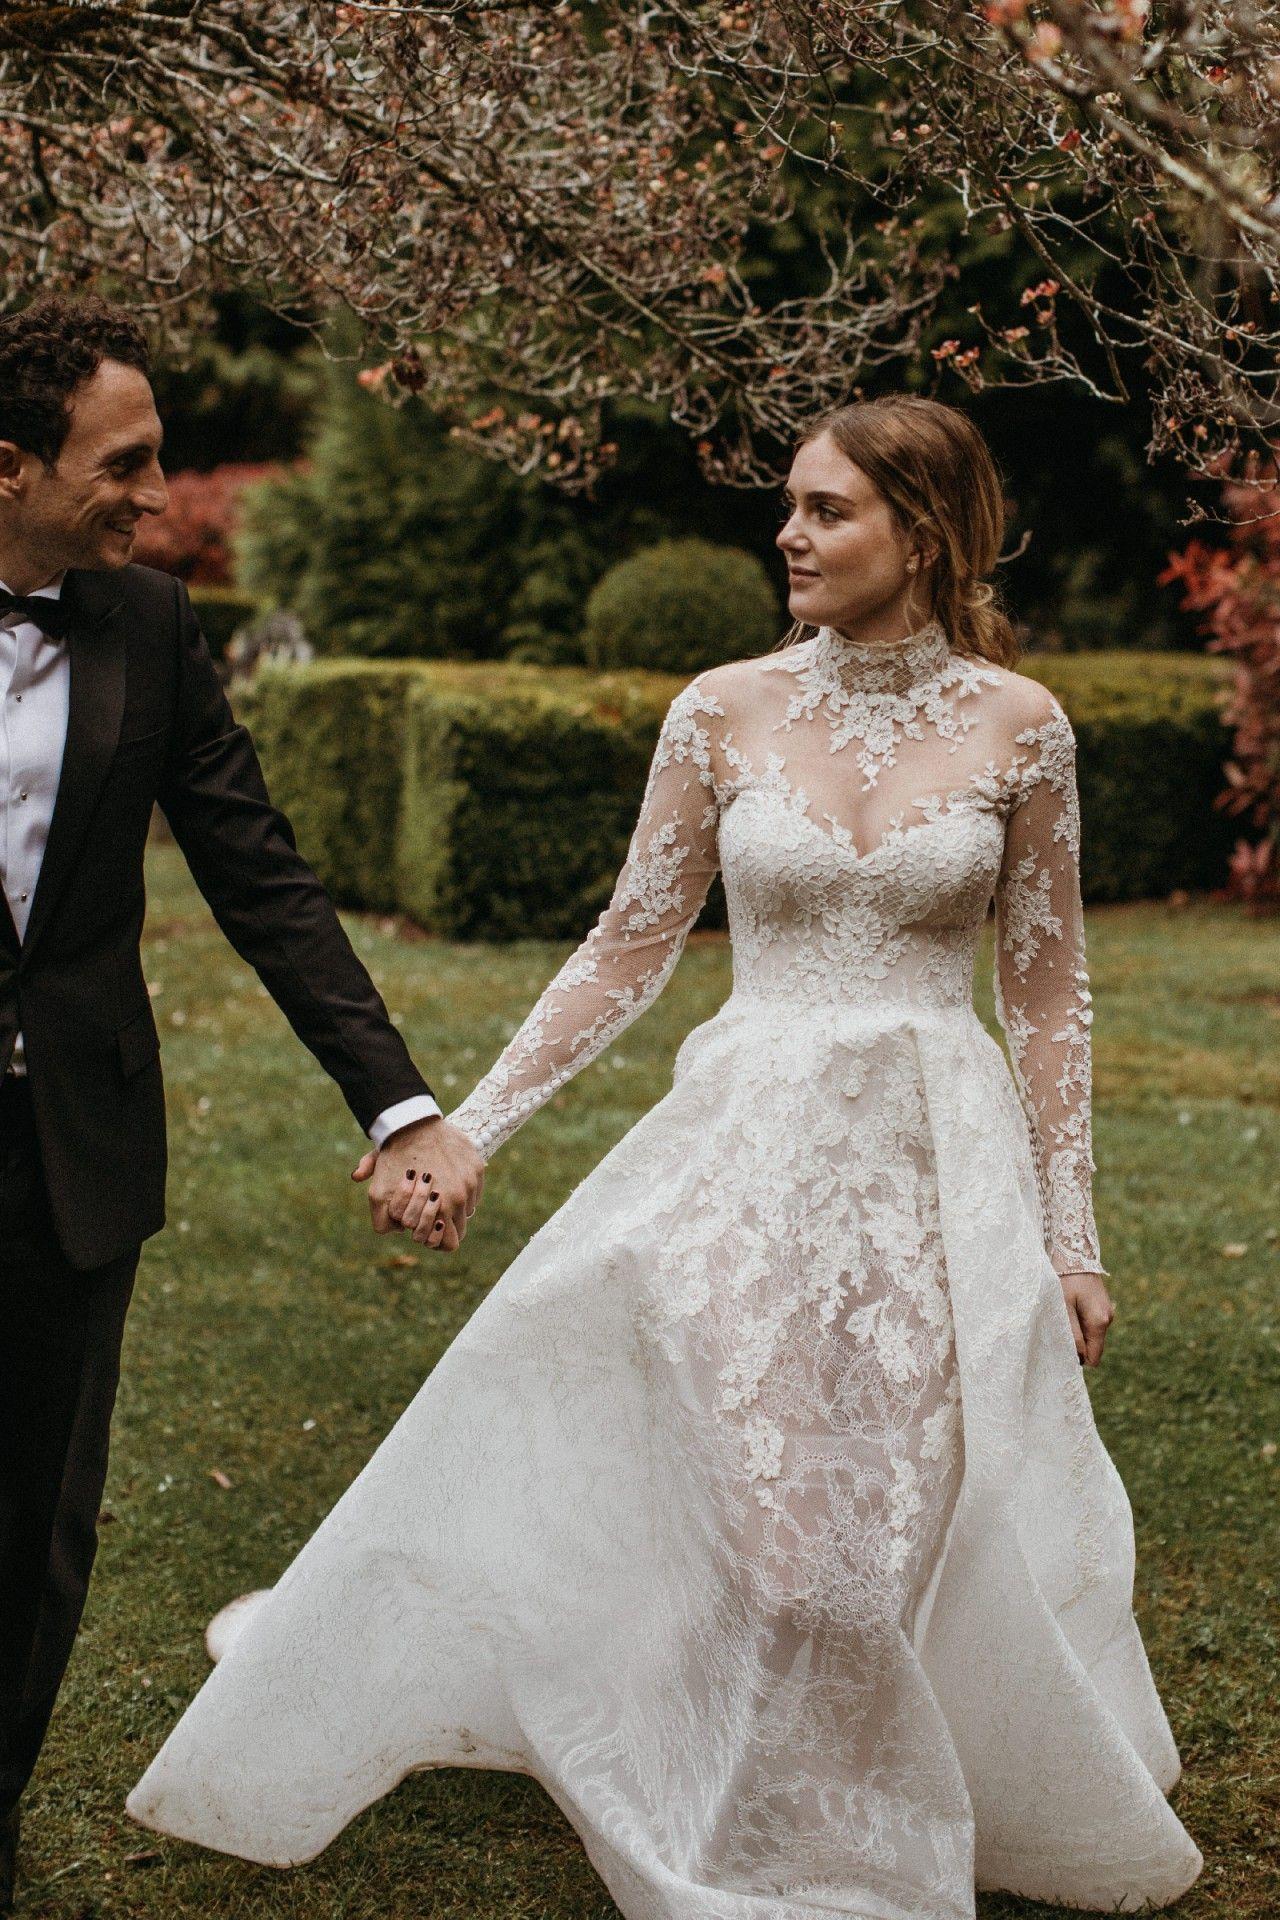 Steven Khalil Custom Made Preloved Wedding Dress Wedding Dresses Preloved Wedding Dresses Professional Dresses [ 1920 x 1280 Pixel ]